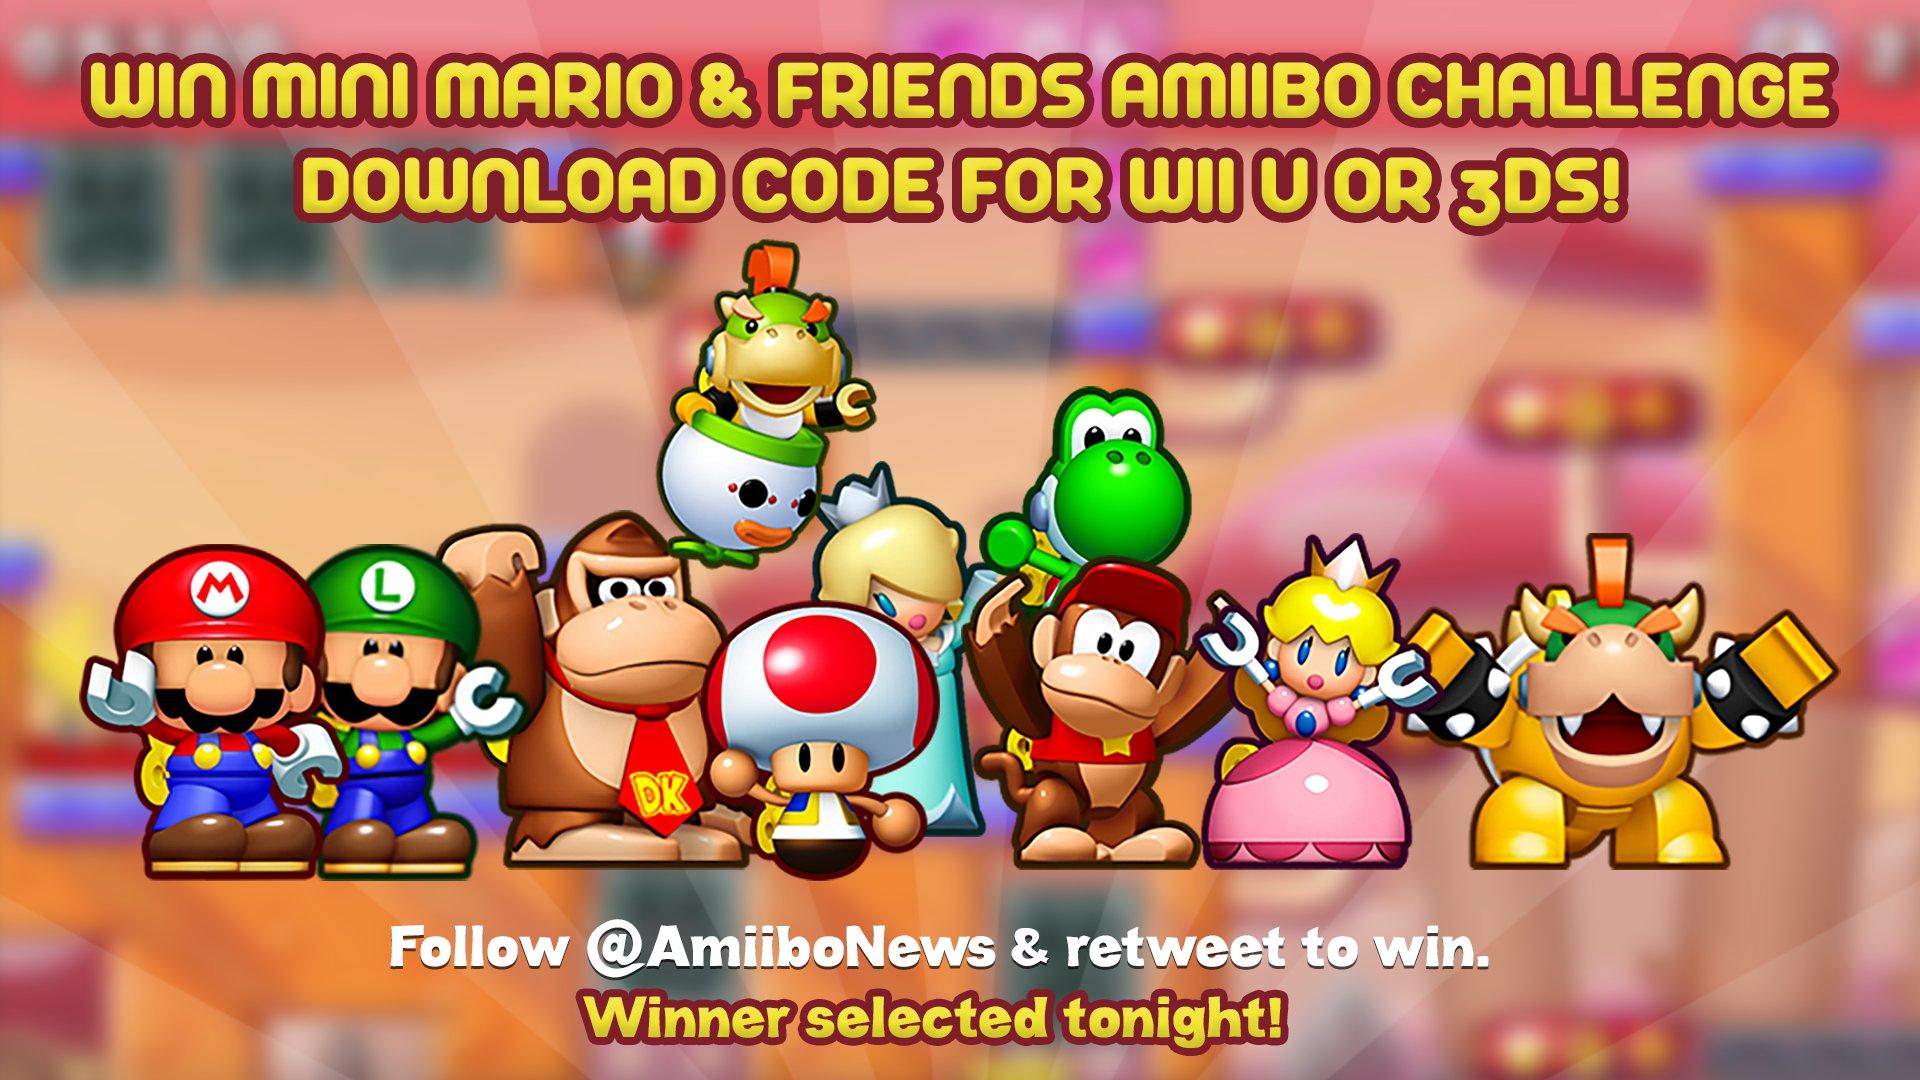 Amiibo News En Twitter Win A Mini Mario Friends Amiibo